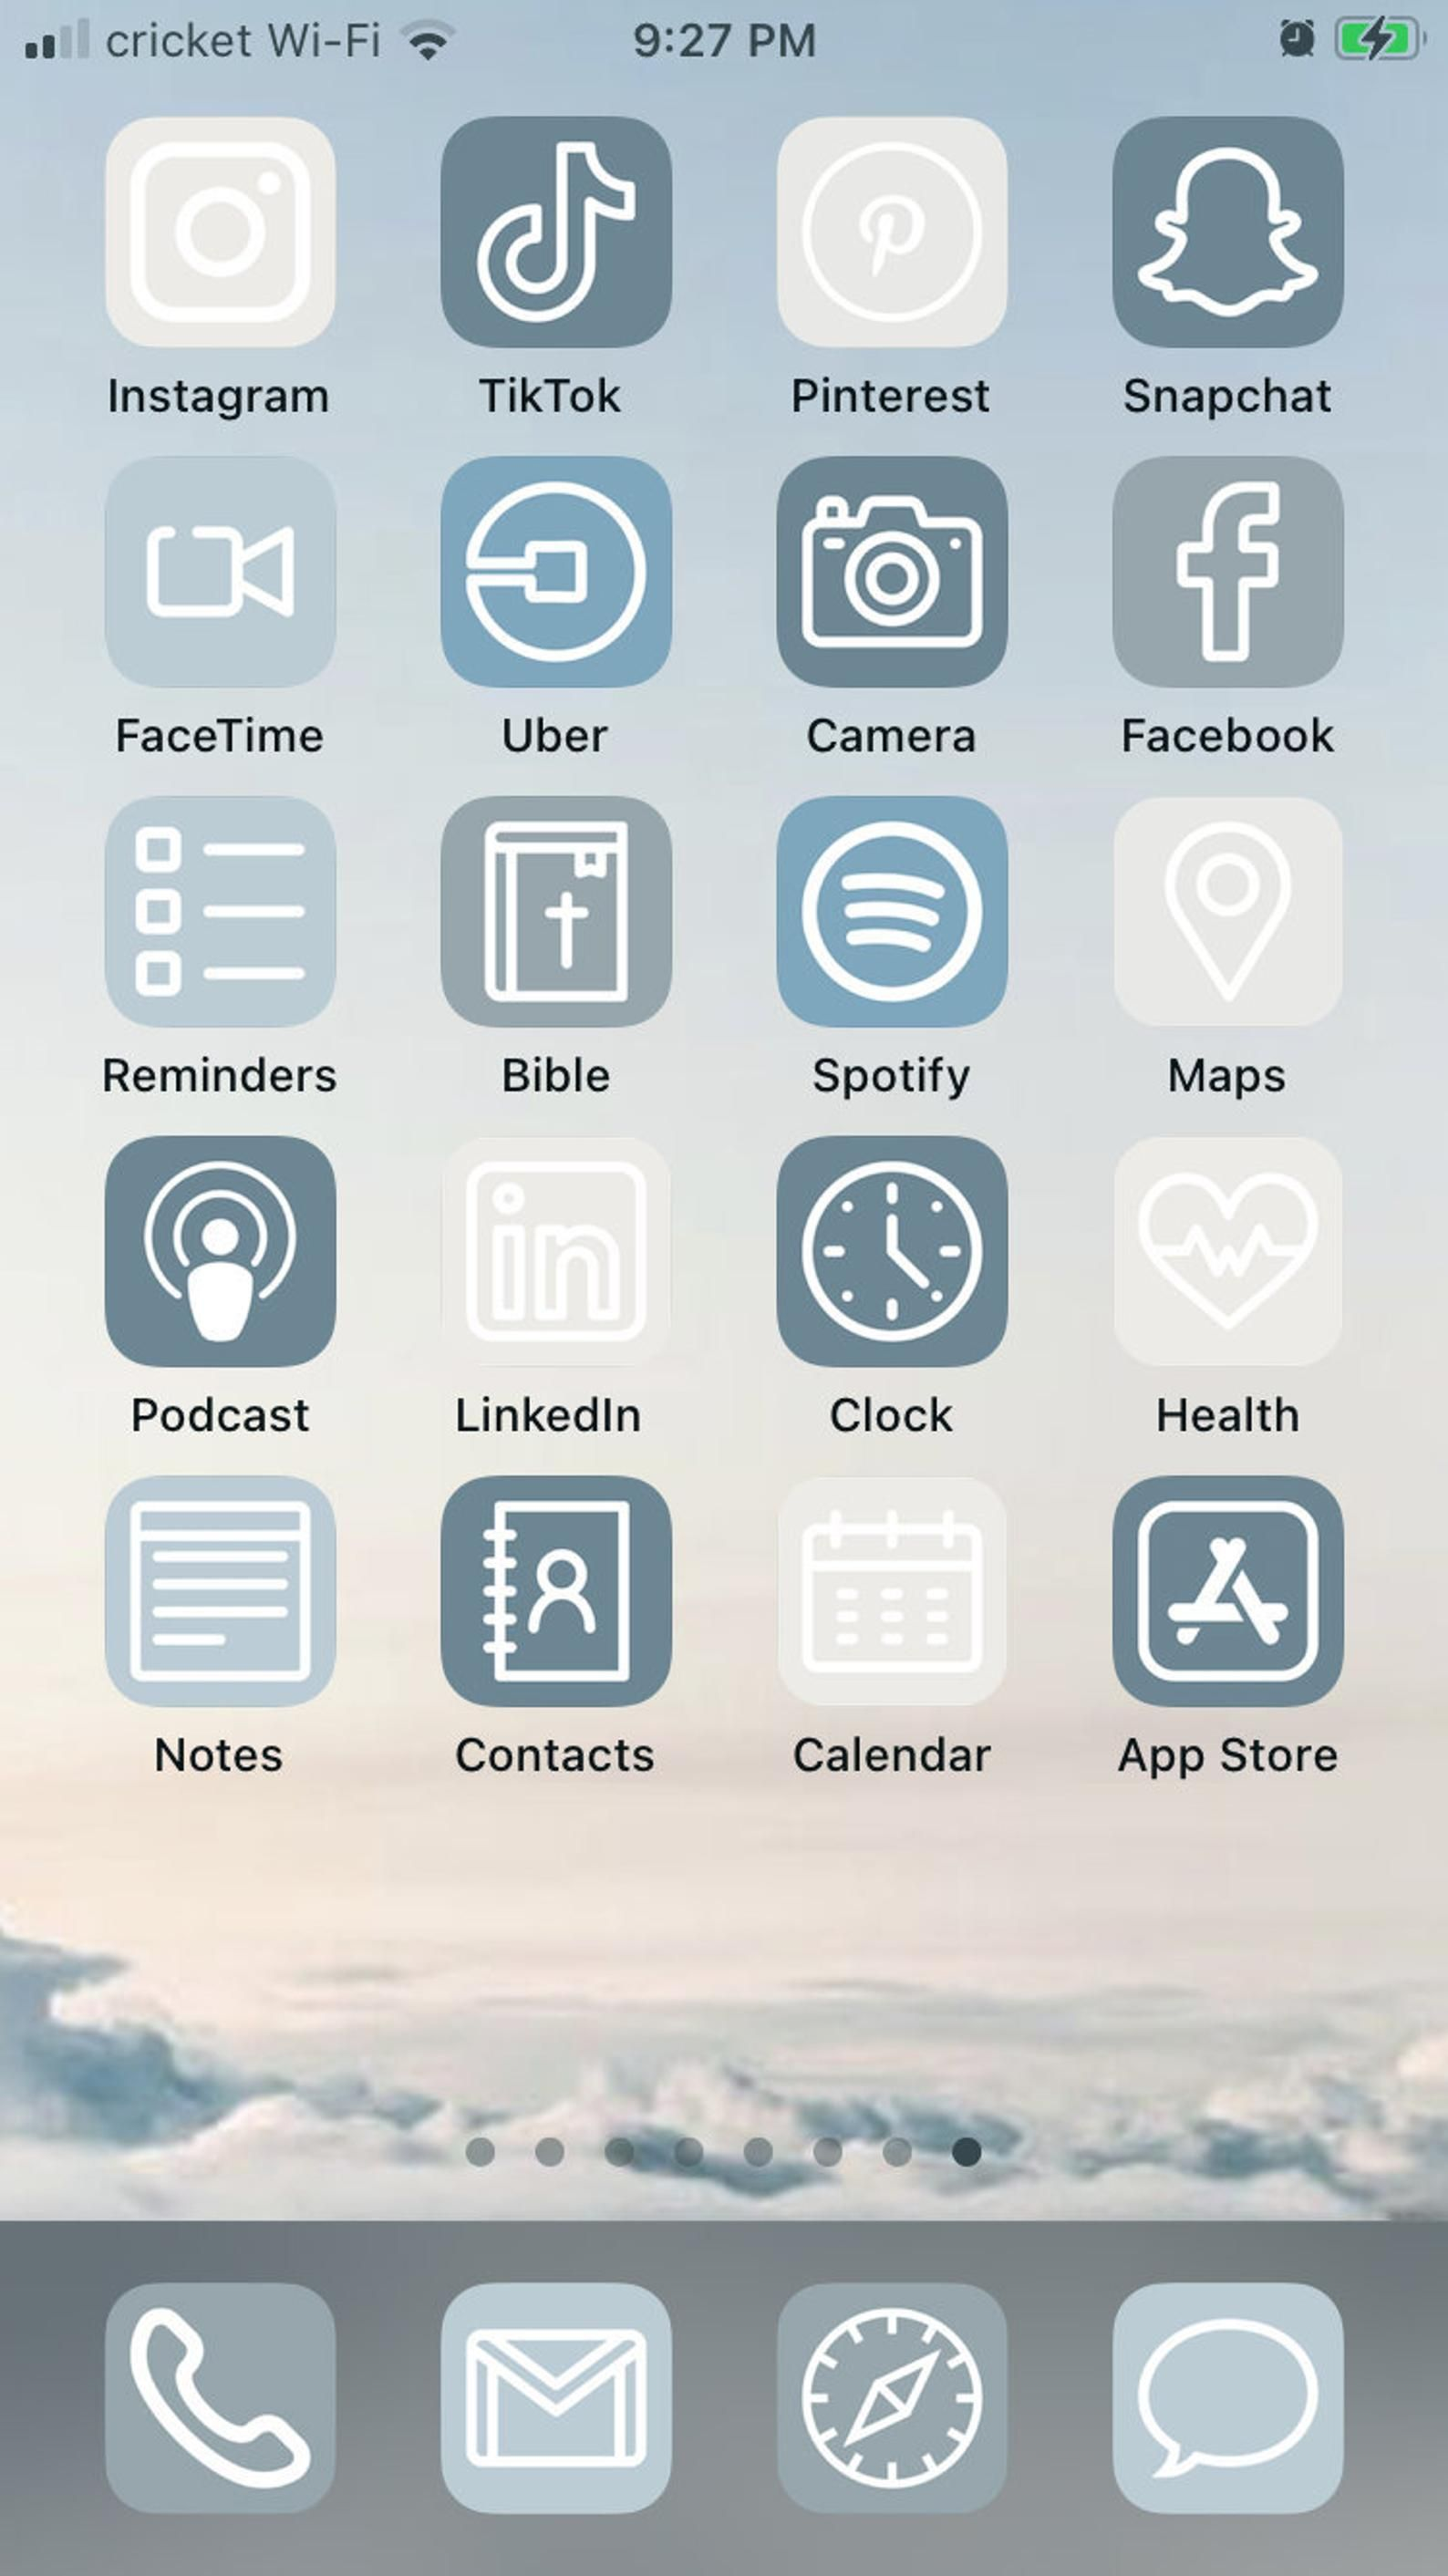 Blue Skies iOS 14 Aesthetic iPhone App Icons - 50